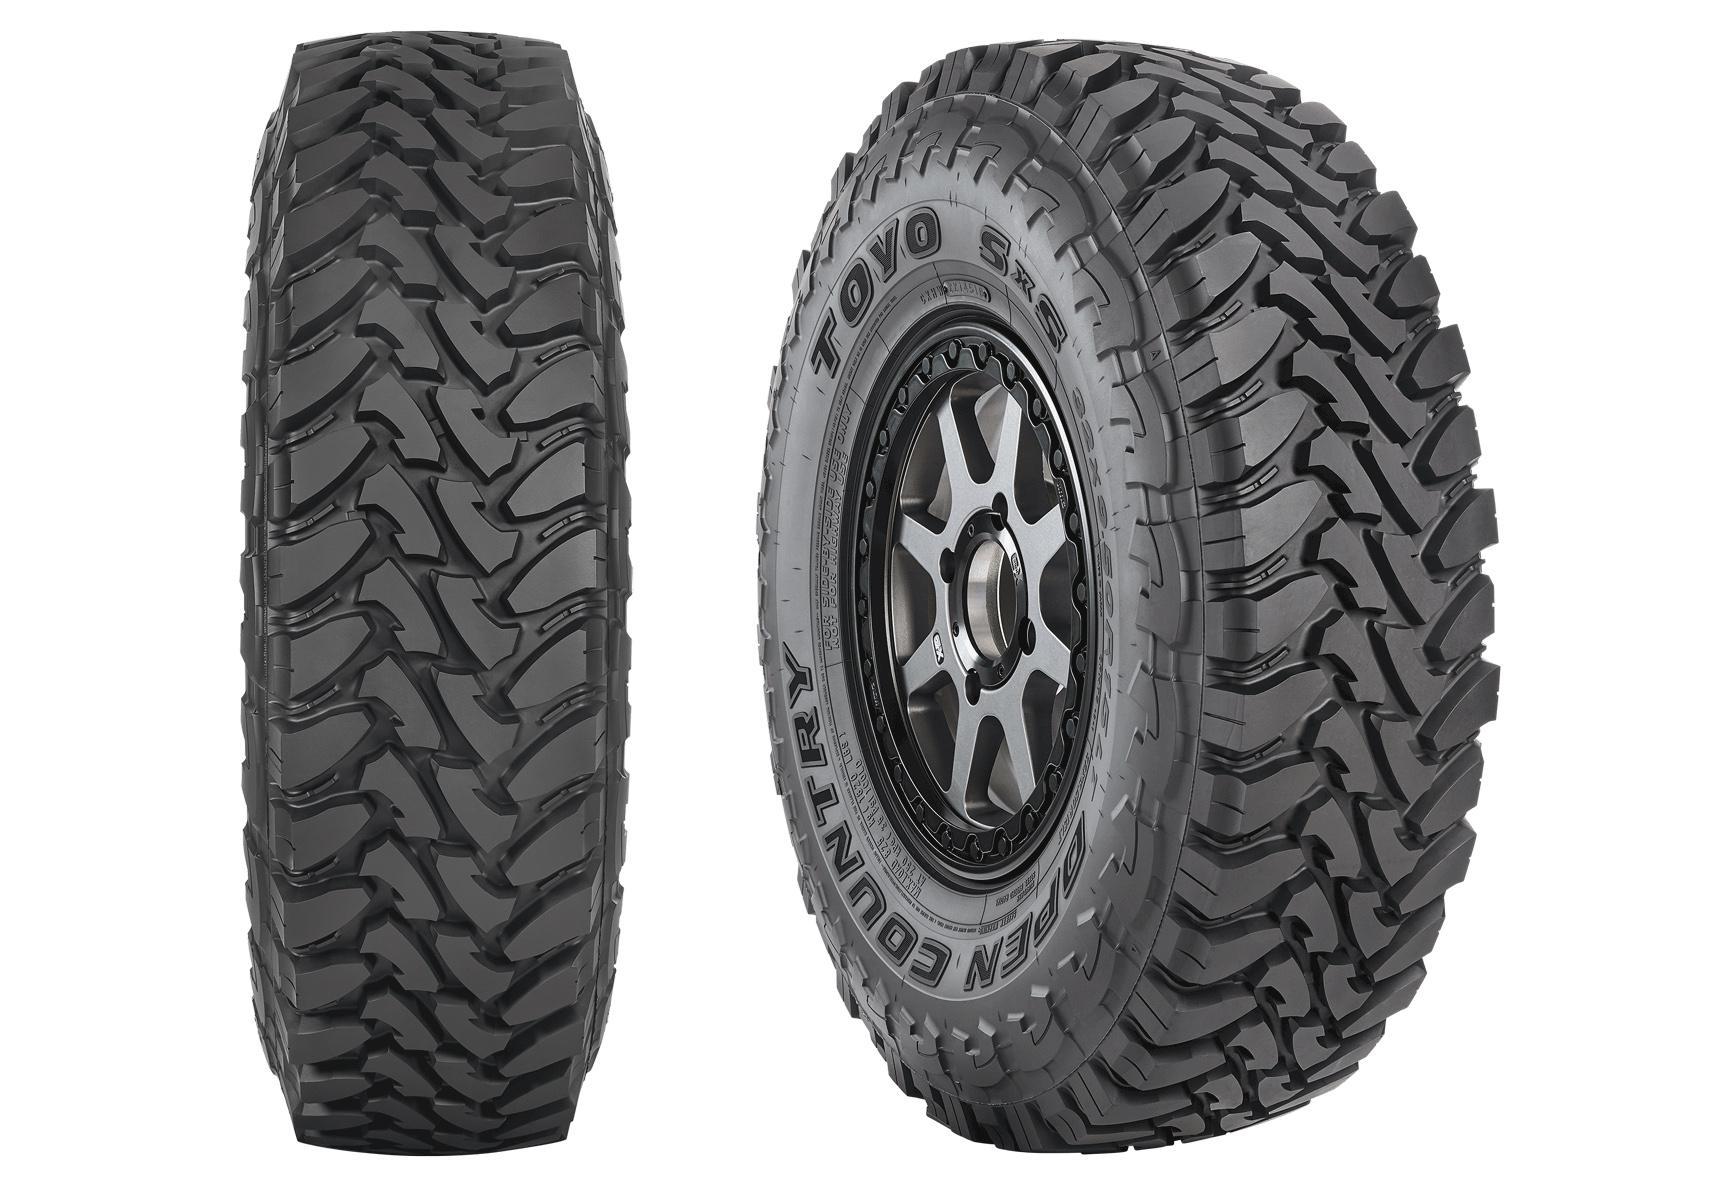 Toyo Tires дебютировала в сегменте шин для мотовездехов side-by-side